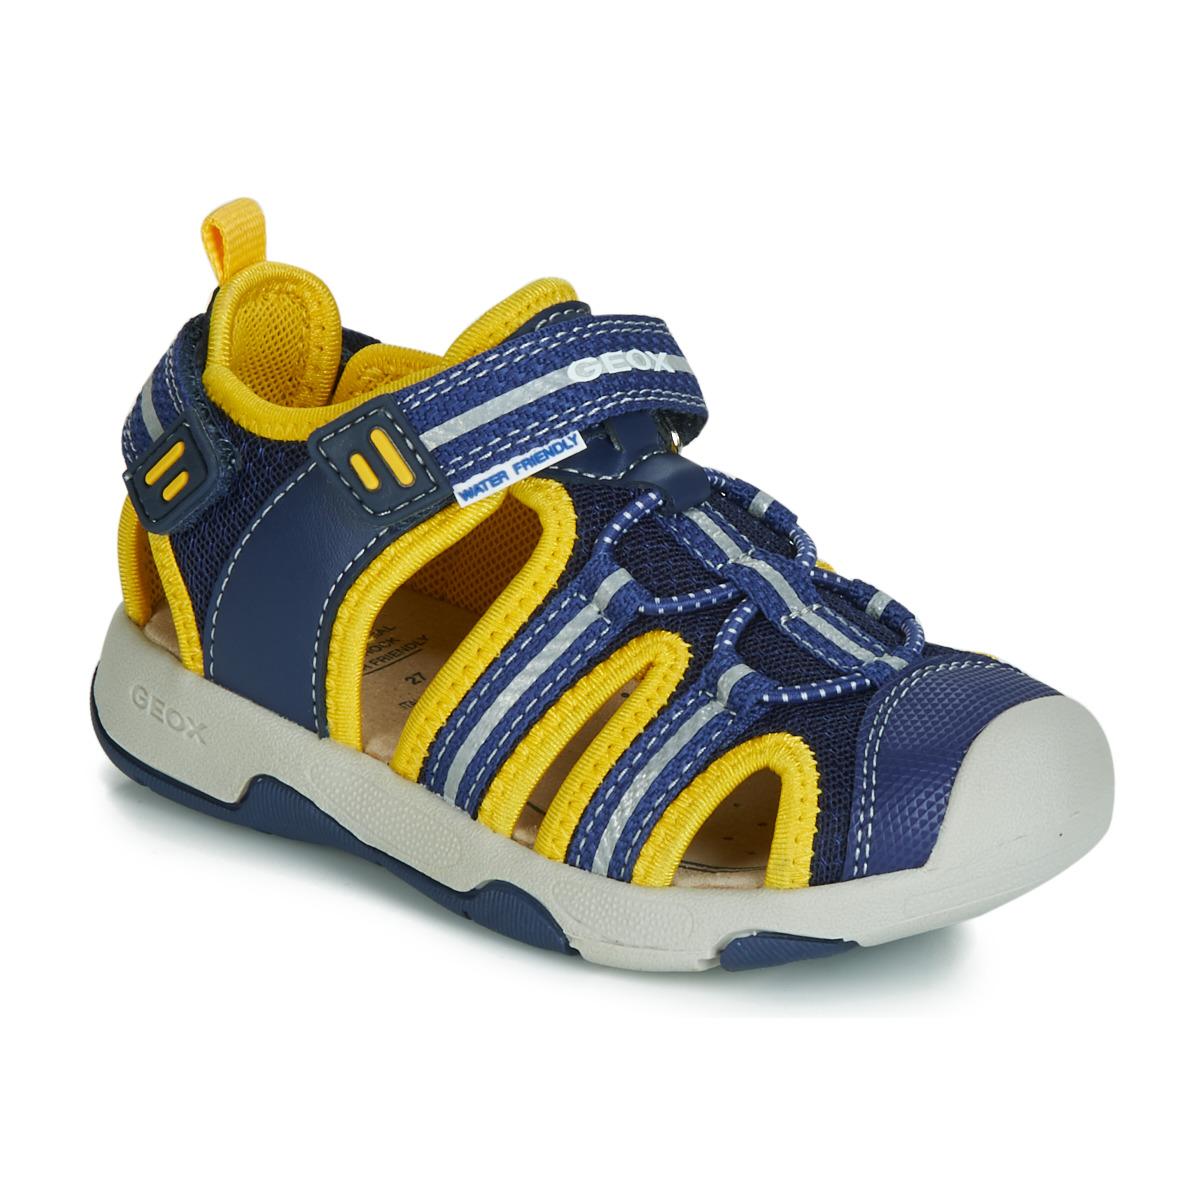 Sandaler til børn Geox  B SANDAL MULTY BOY